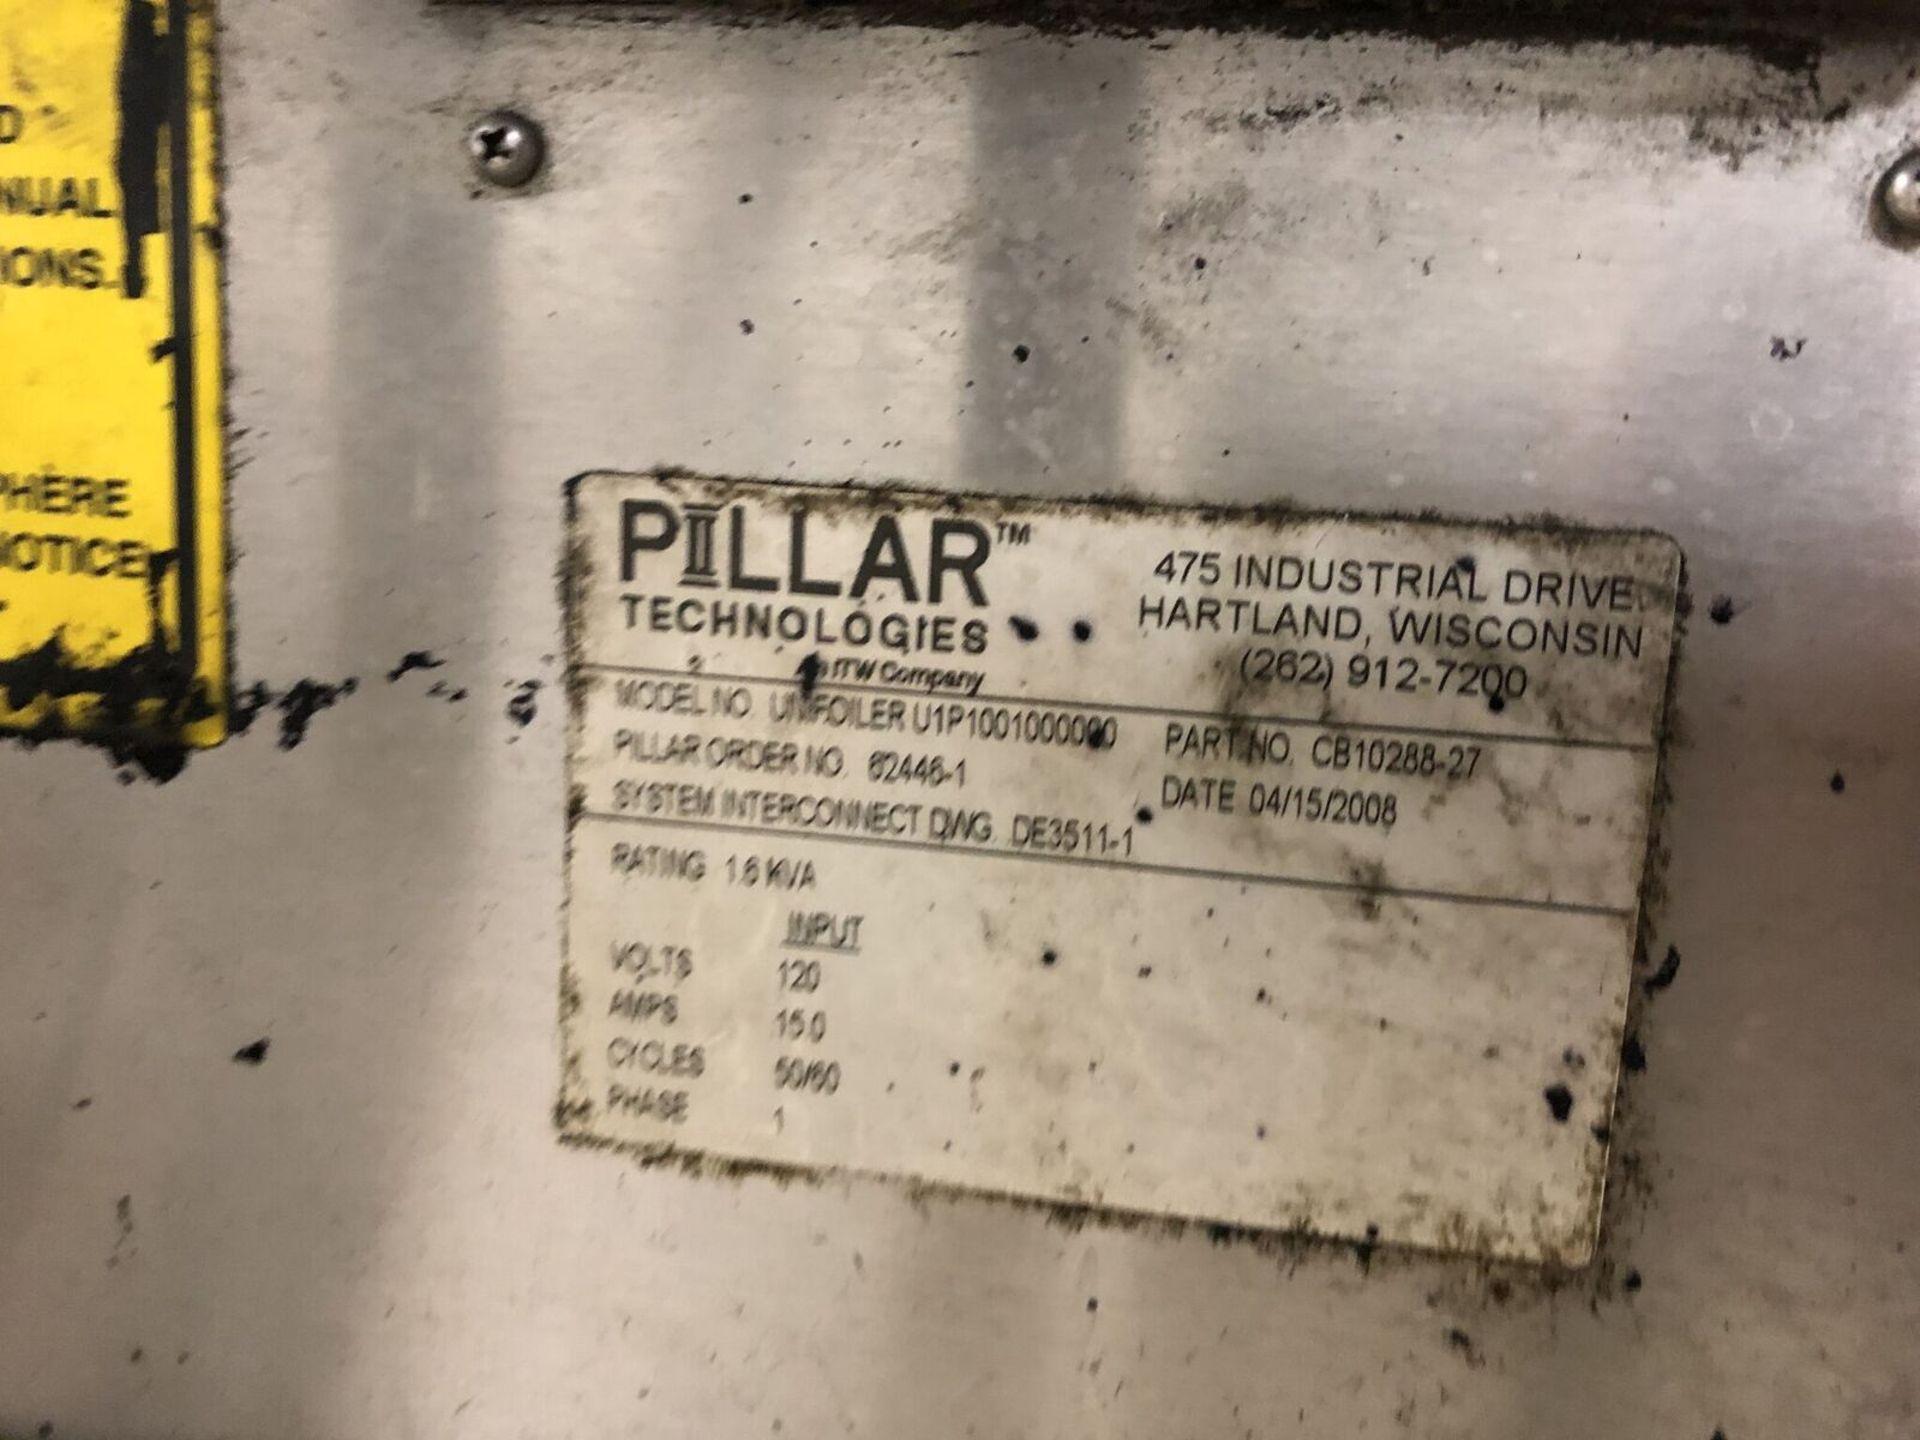 Lot 50 - Pillar Technologies Unifoiler Cap Sealing Machine, Model #U1P1001000000, DOM April 2009